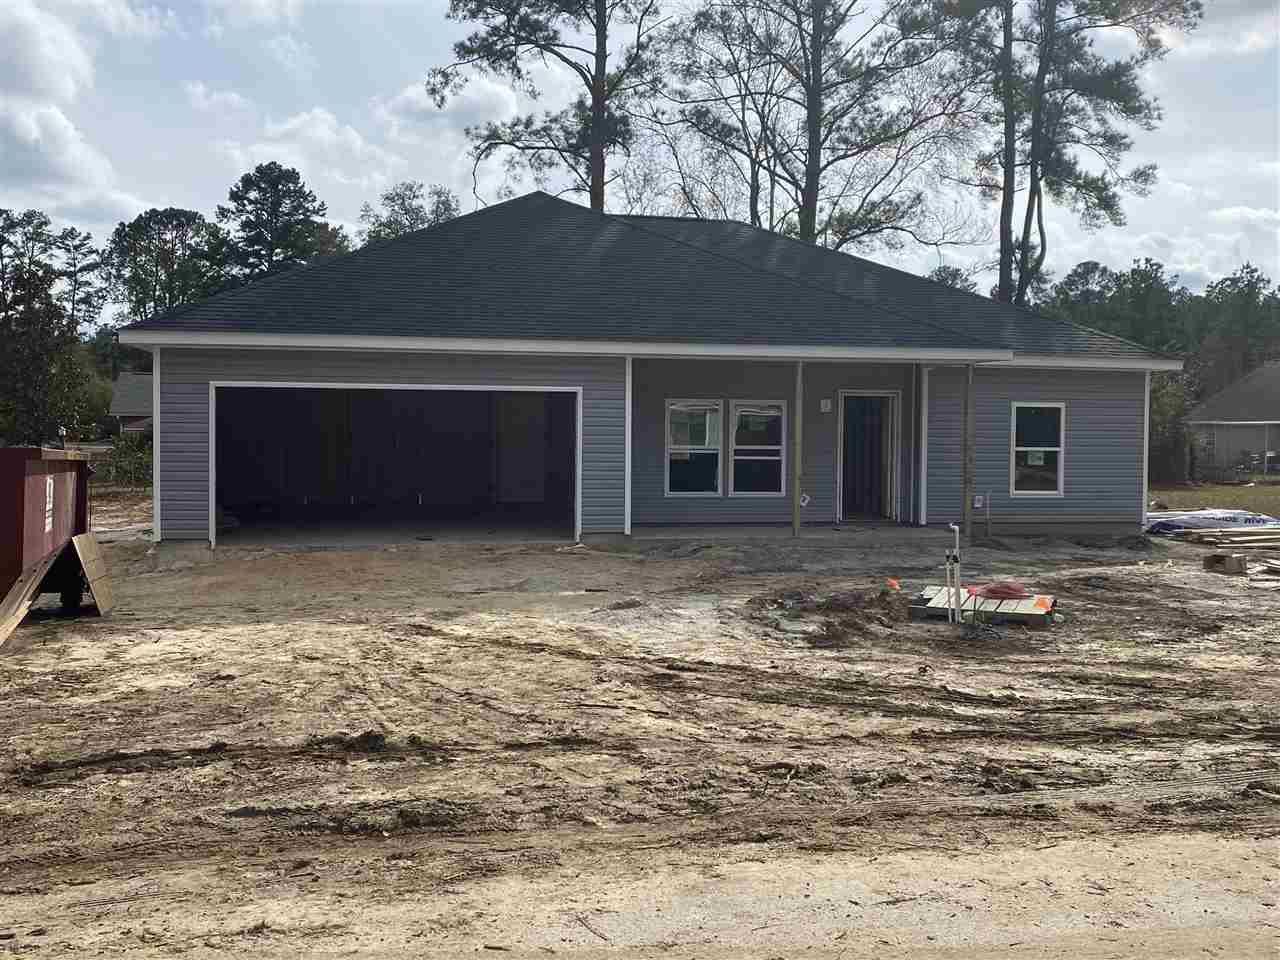 270 Kimberly Lane, Monticello, FL 32344 - MLS#: 326312